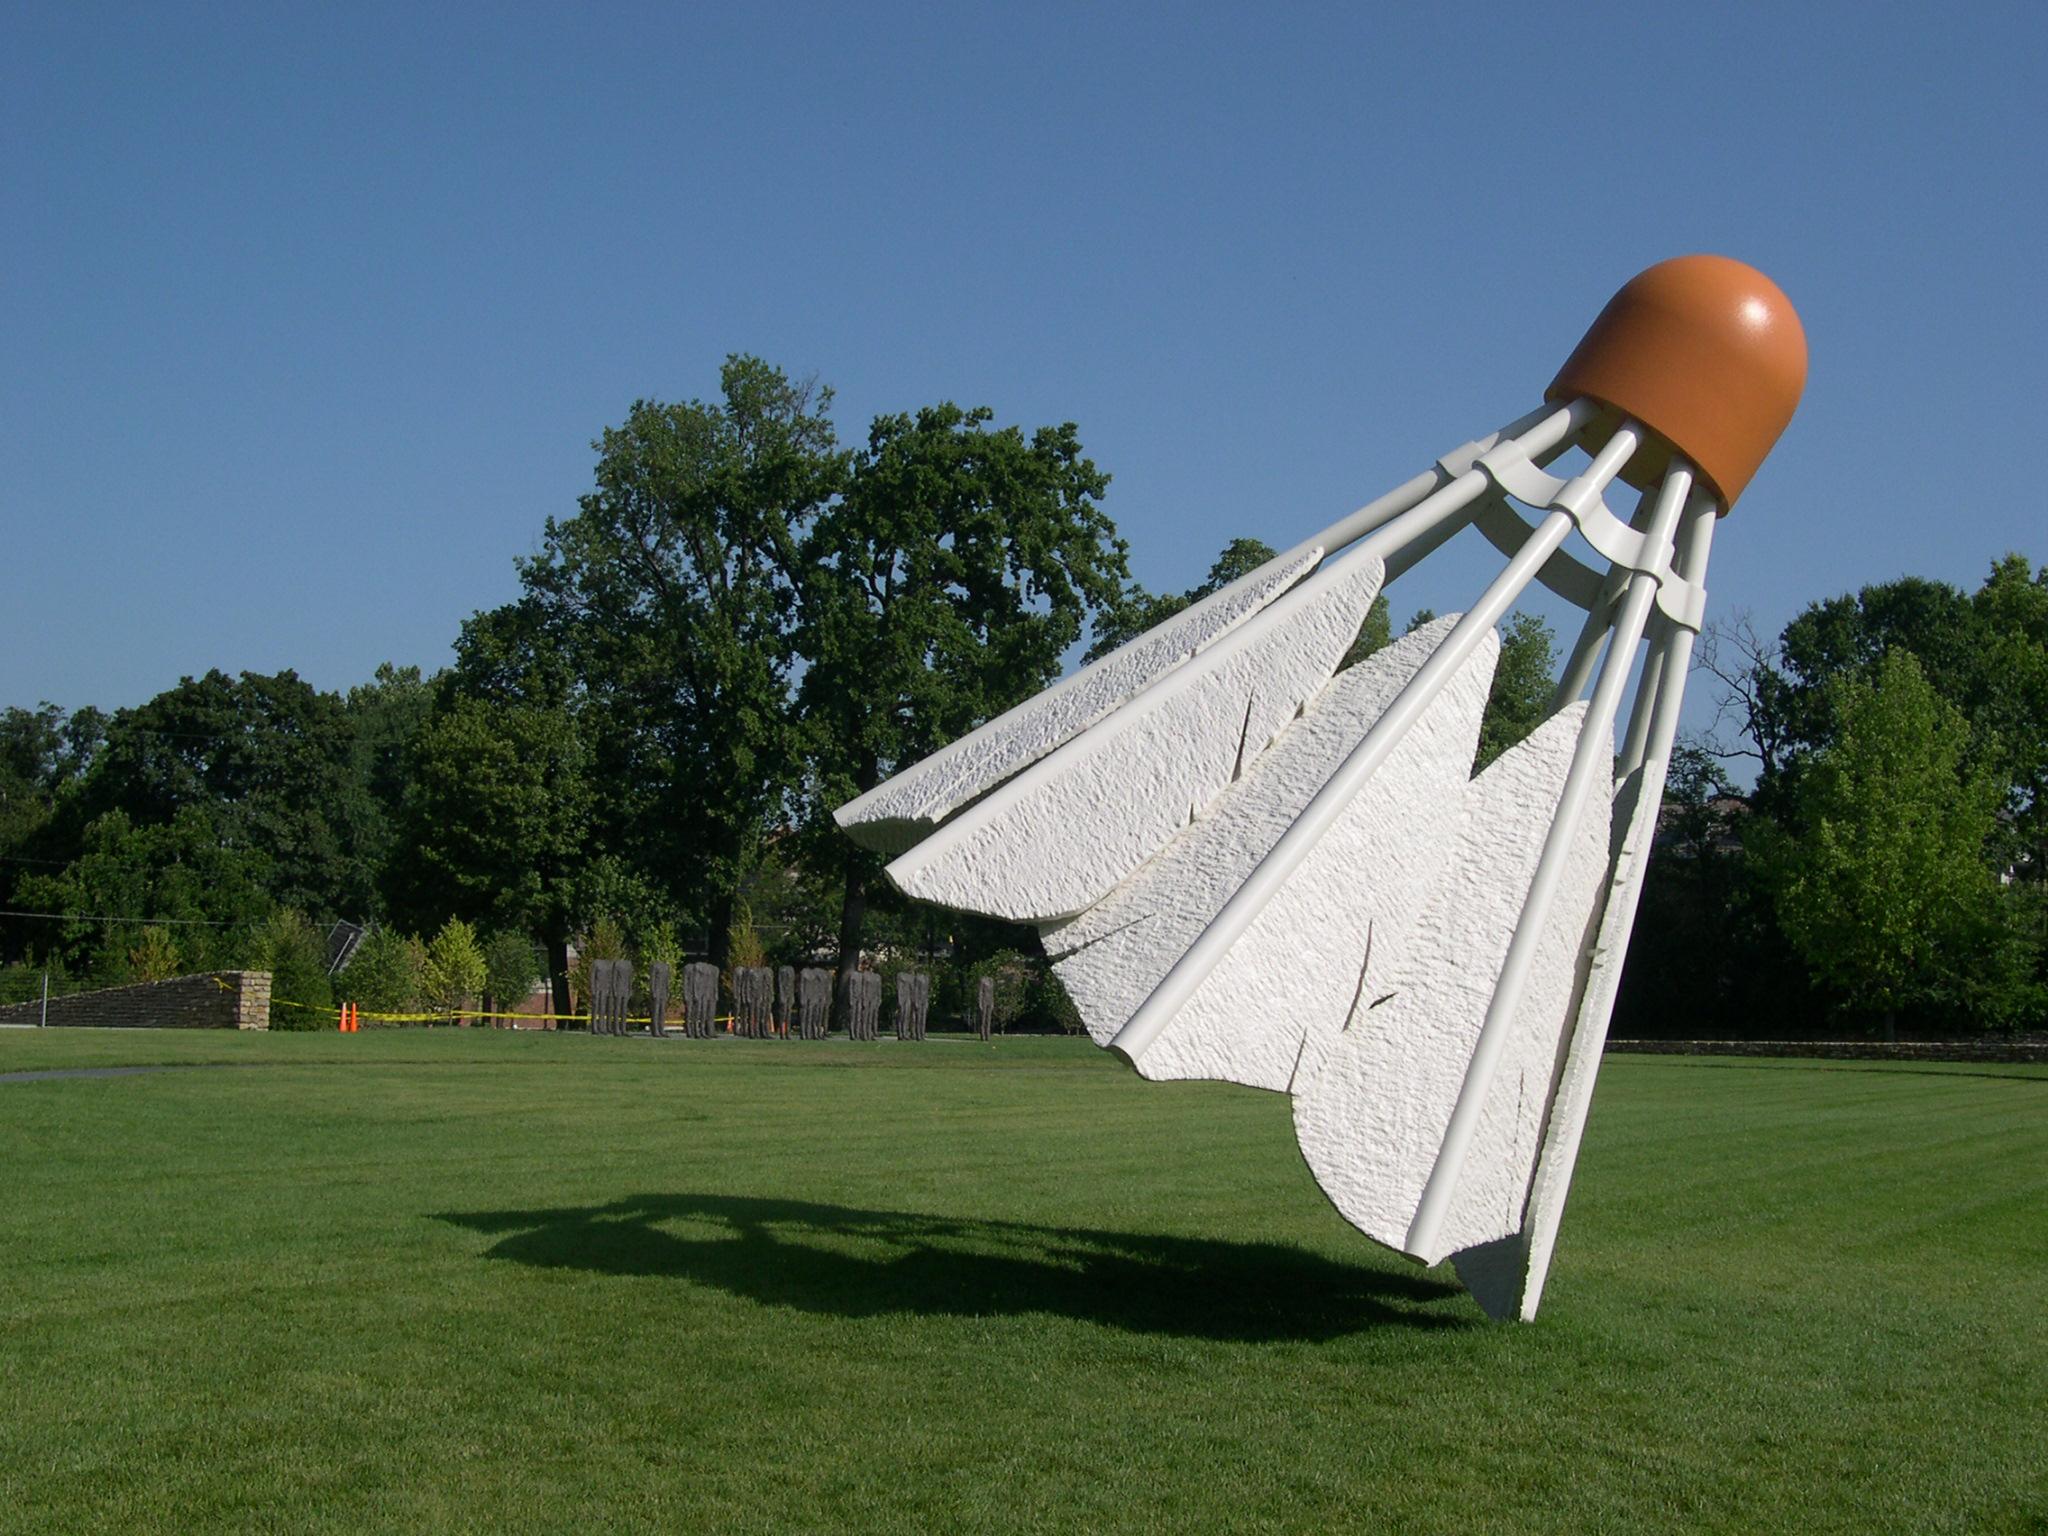 «Воланы» (Claes Oldenburg)